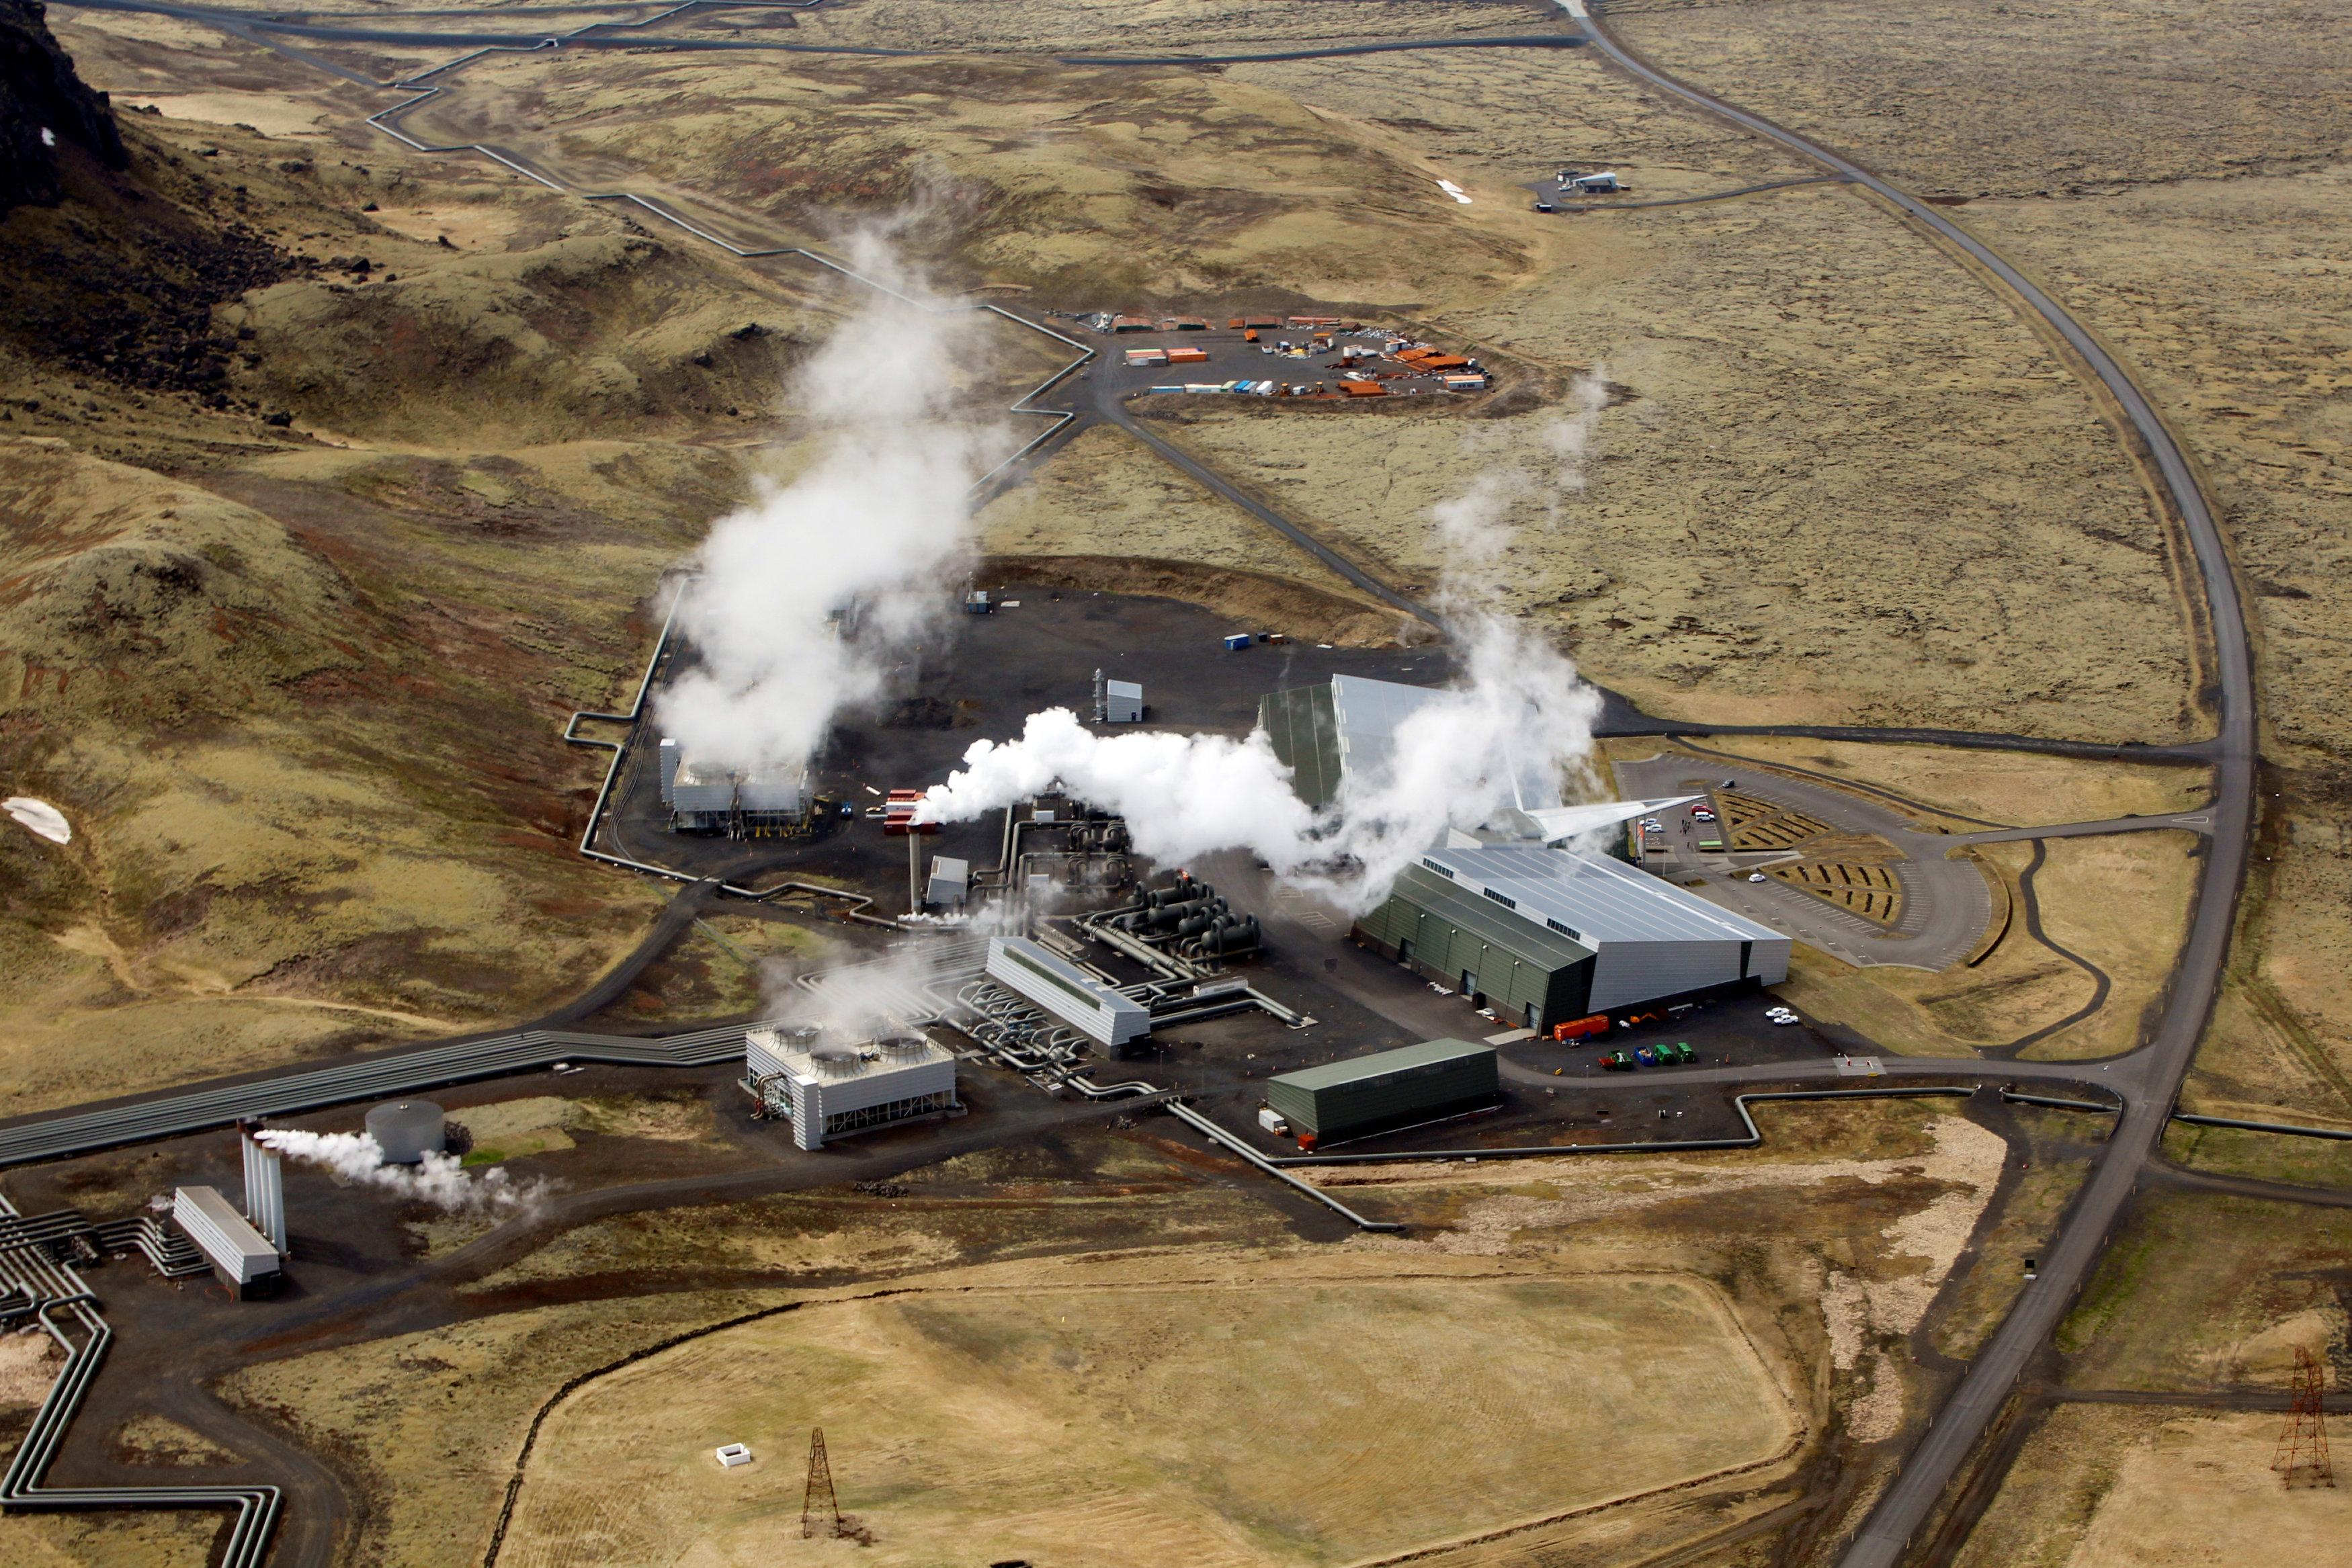 An aerial view of Hellisheidi geothermal power station near Reykjavik, Iceland, June 4, 2016. Picture taken June 4, 2016. REUTERS/Jemima Kelly